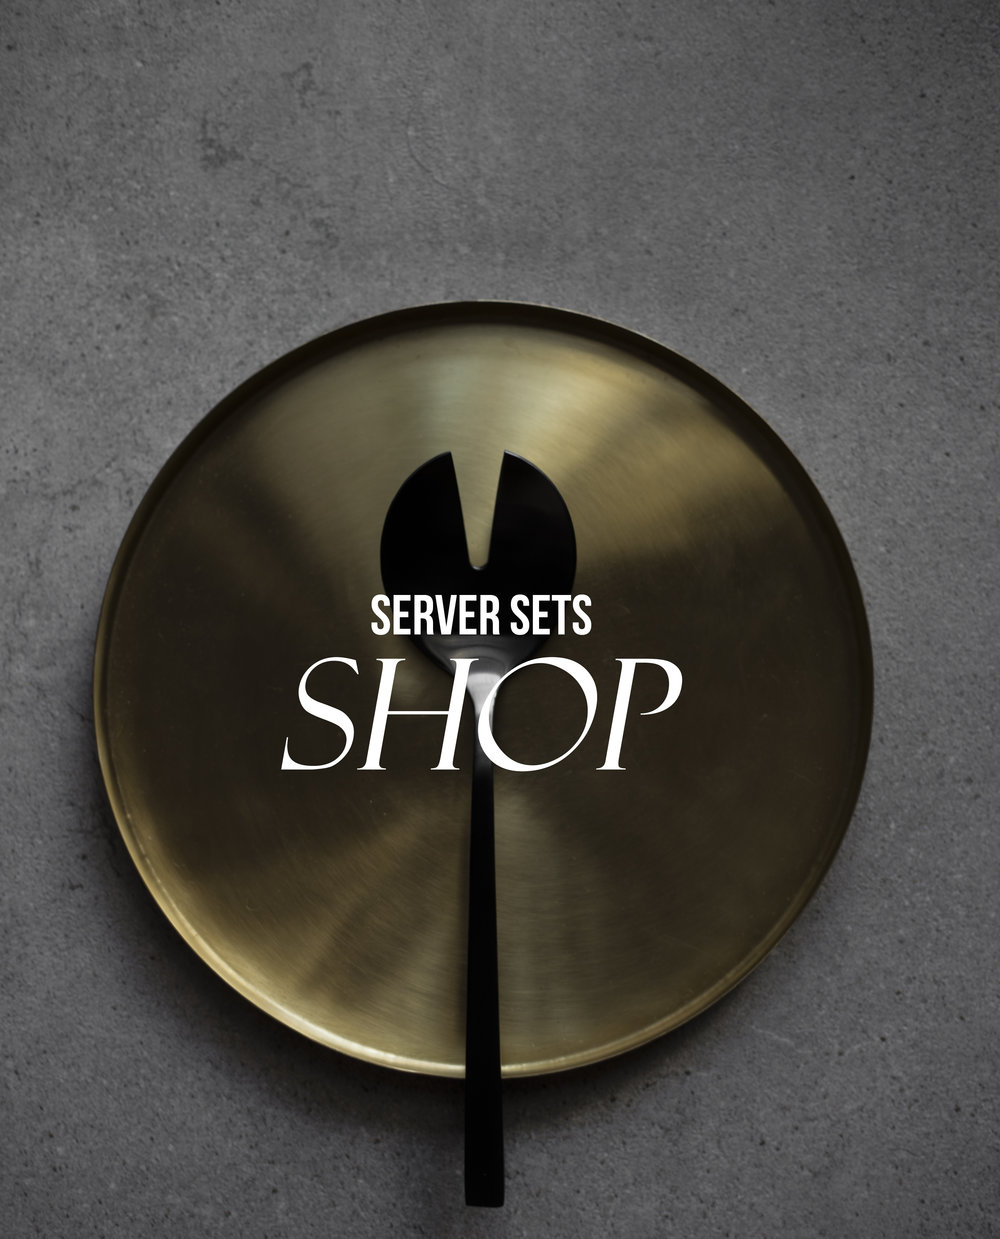 shop servers.jpg